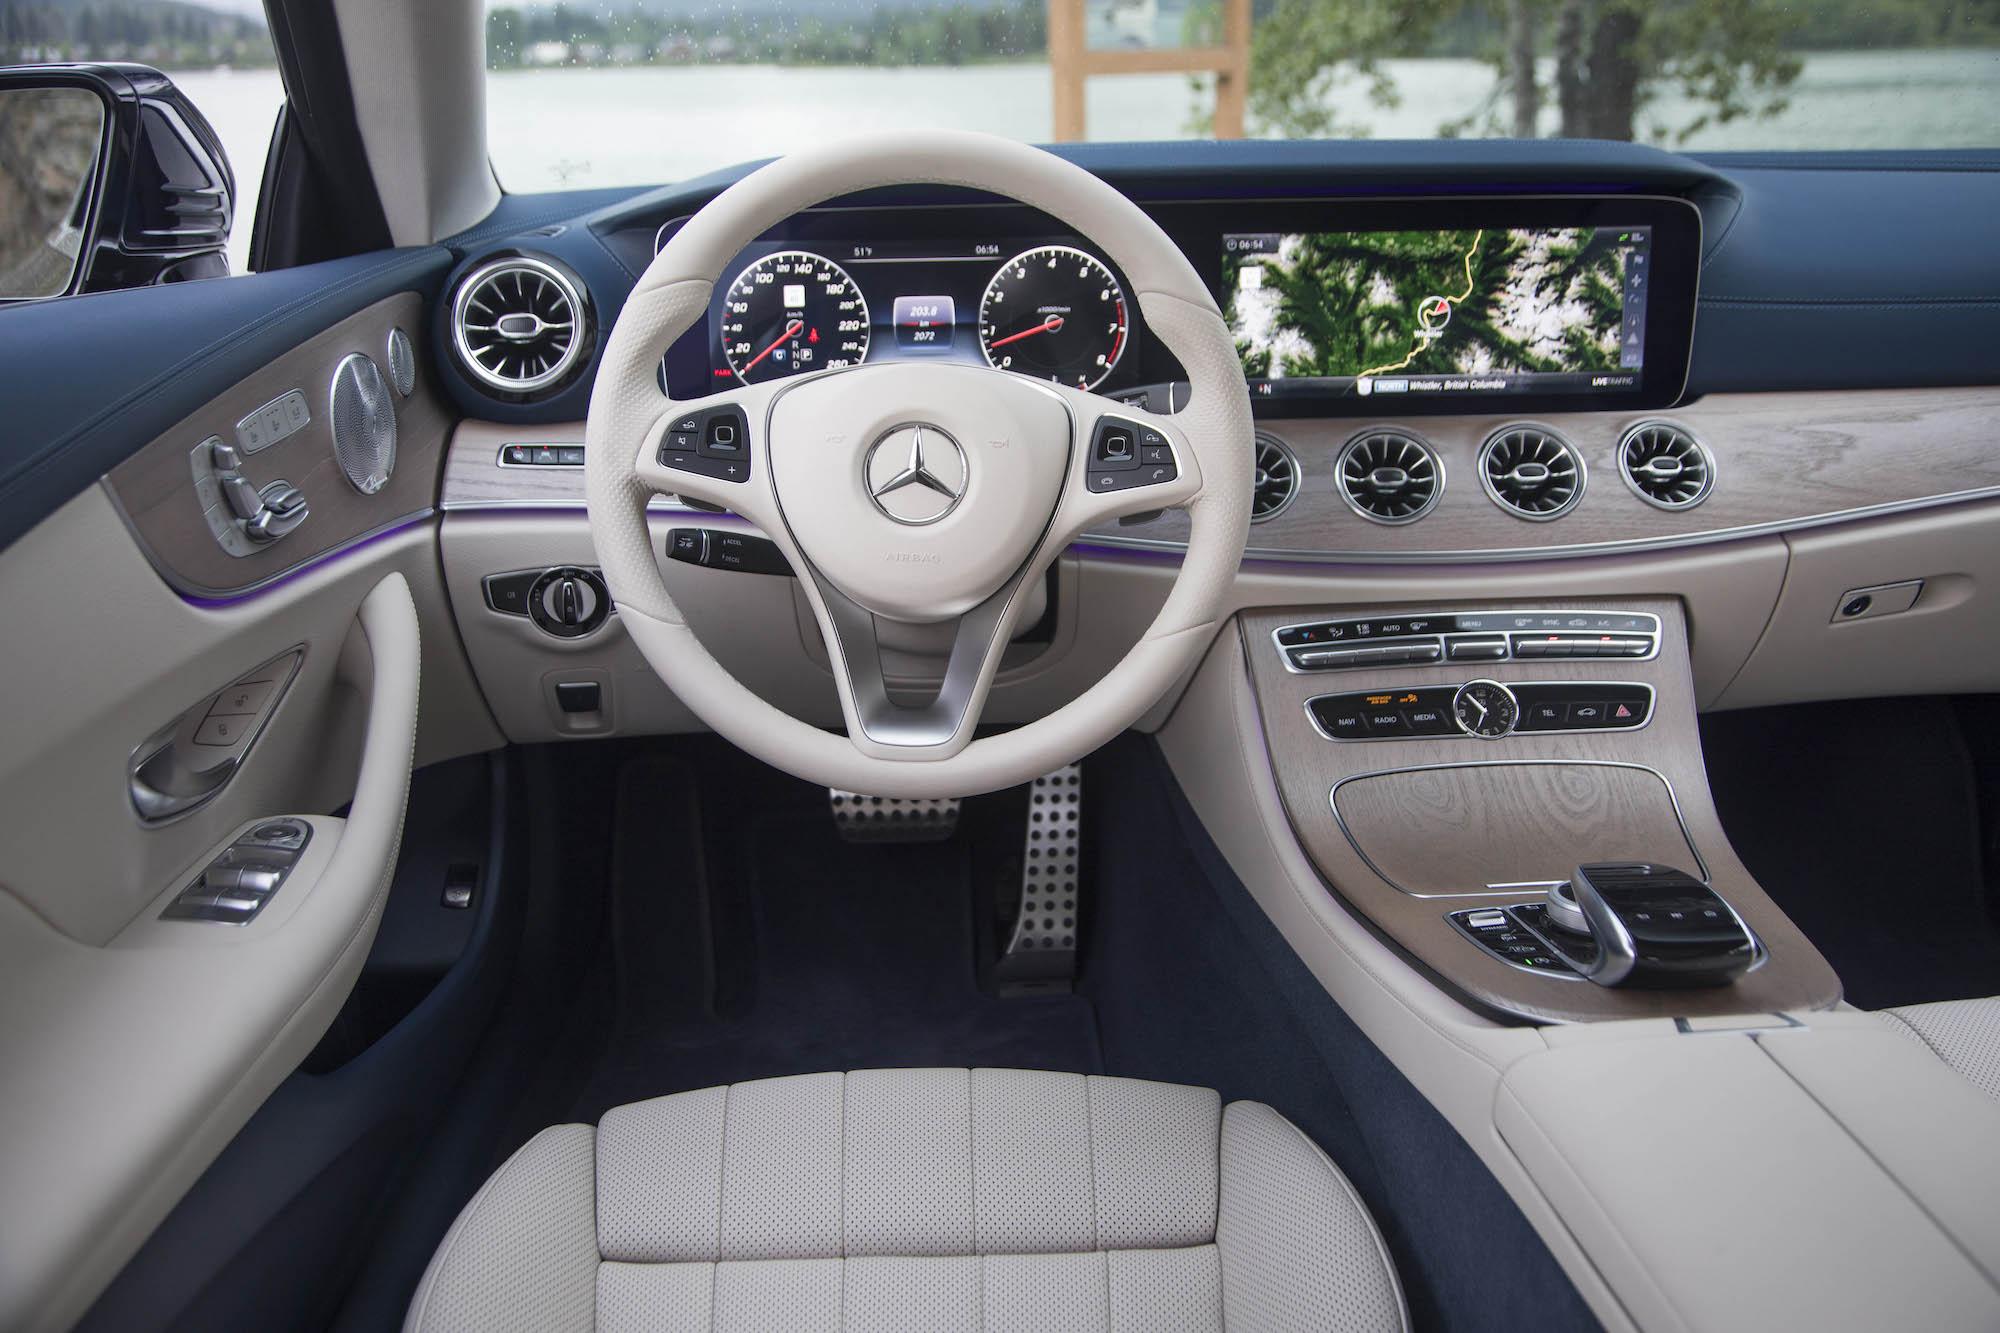 E400 Coupe 2018 >> First Drive: 2018 Mercedes-Benz E 400 4MATIC Coupe ...